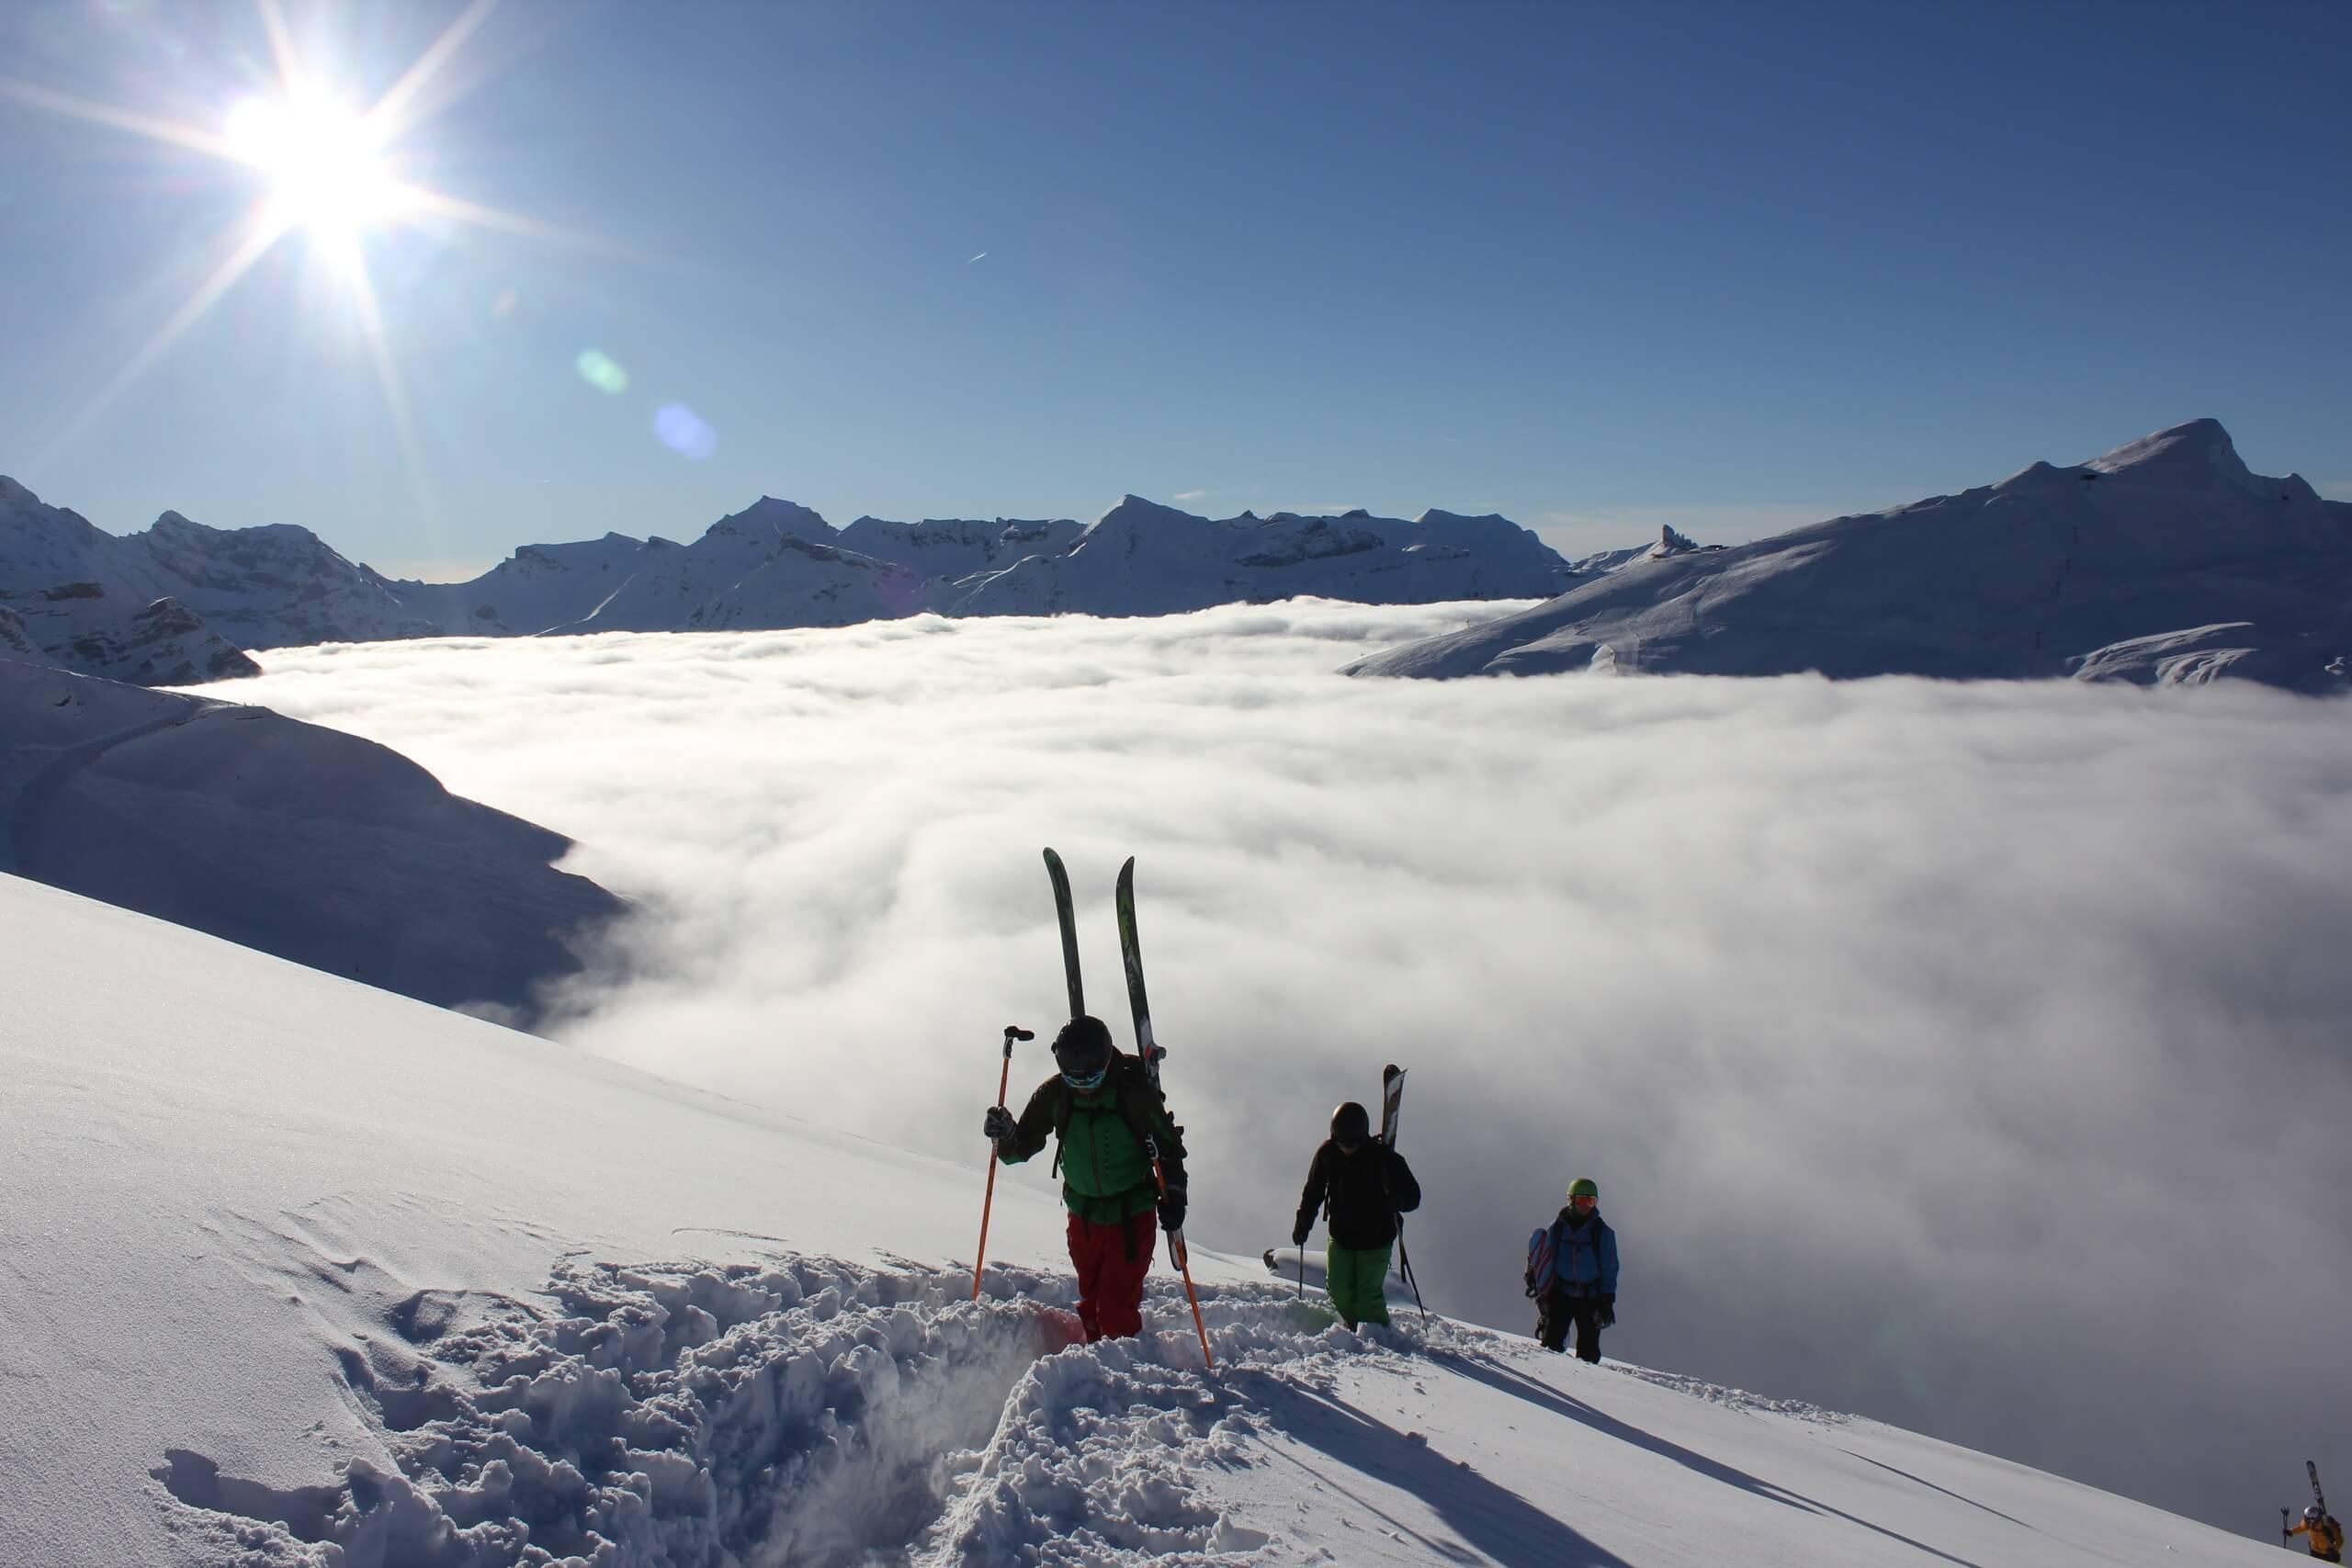 swiss-alpine-guides-ski-tour-freeride-winter